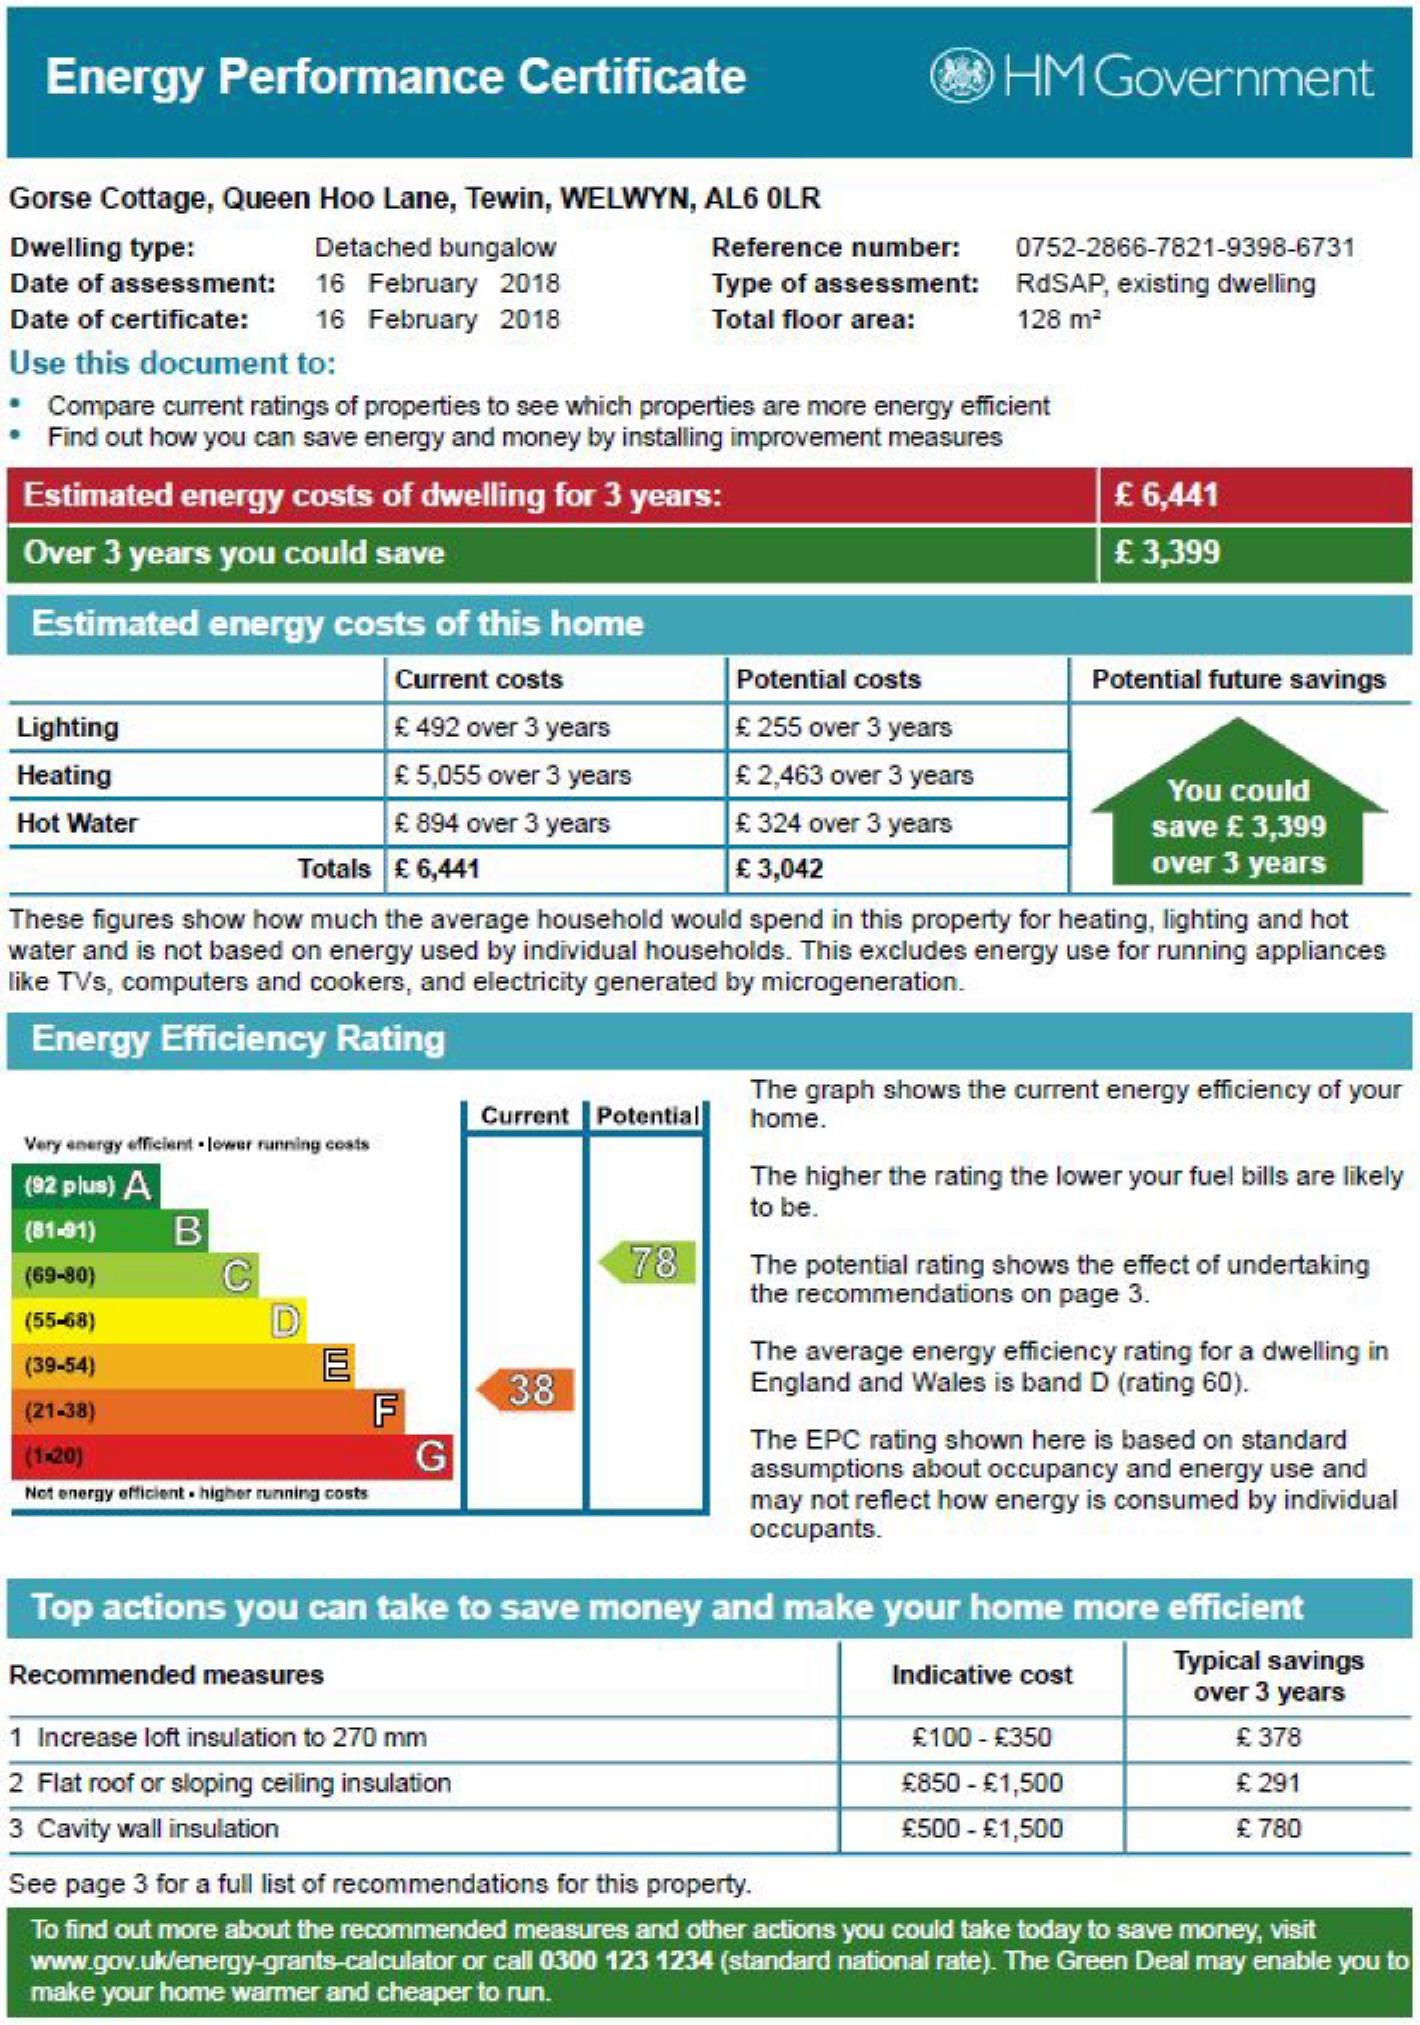 EPC Graph for Queen Hoo Lane, Tewin, Welwyn